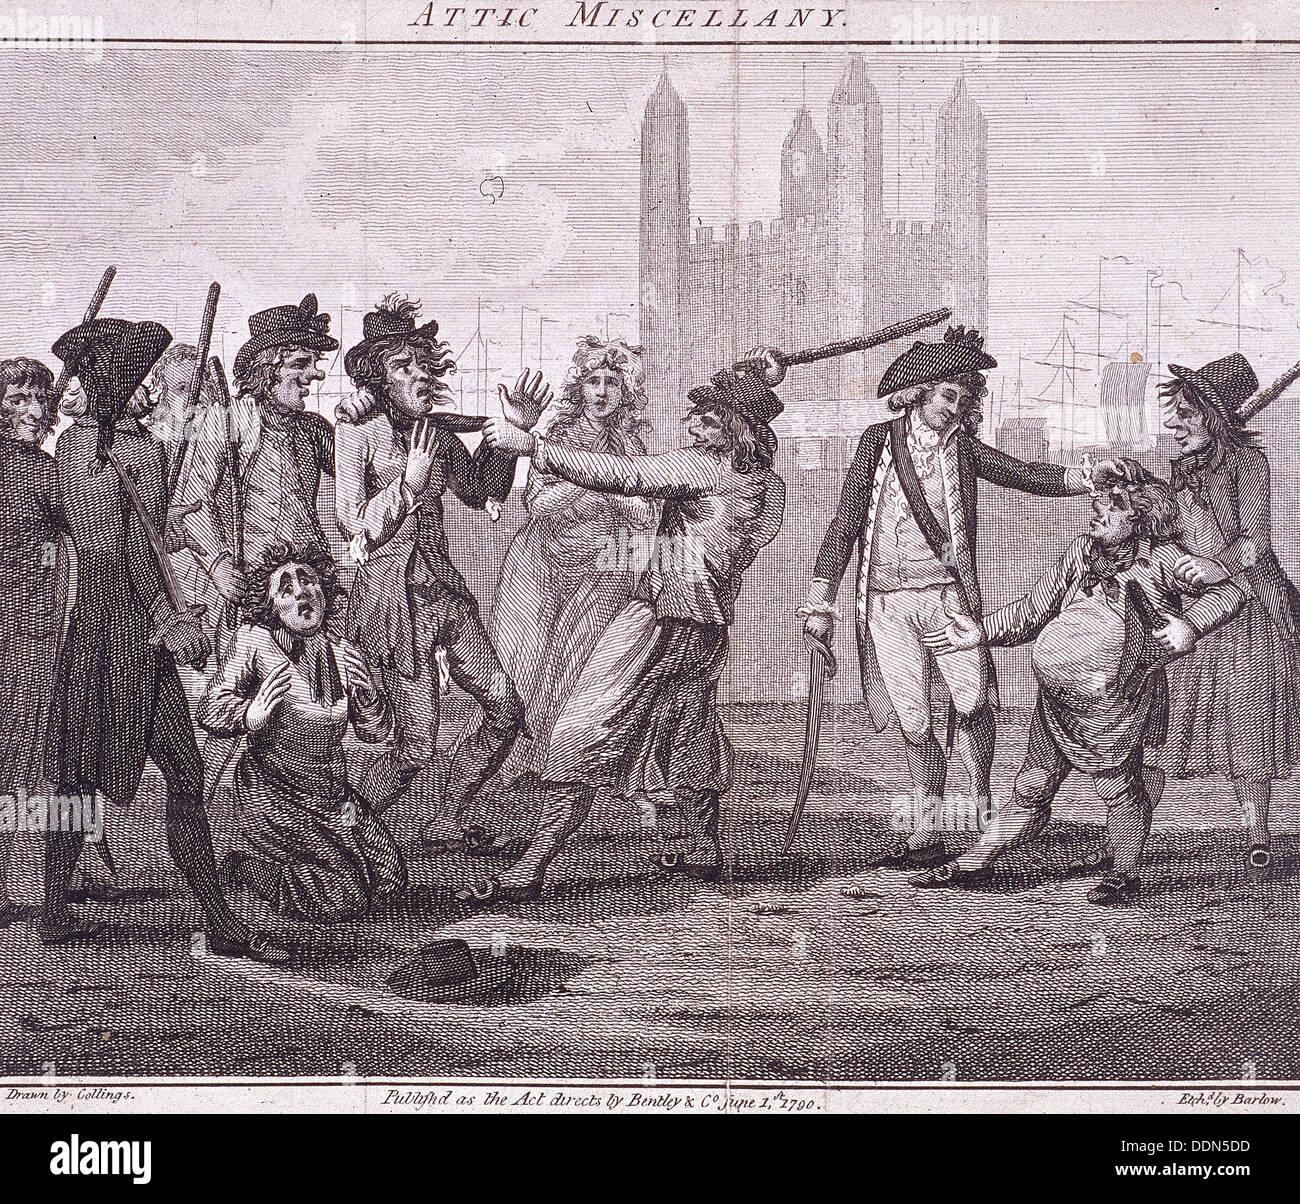 'Manning the navy', Tower Hill, London, 1790. Artist: John Barlow